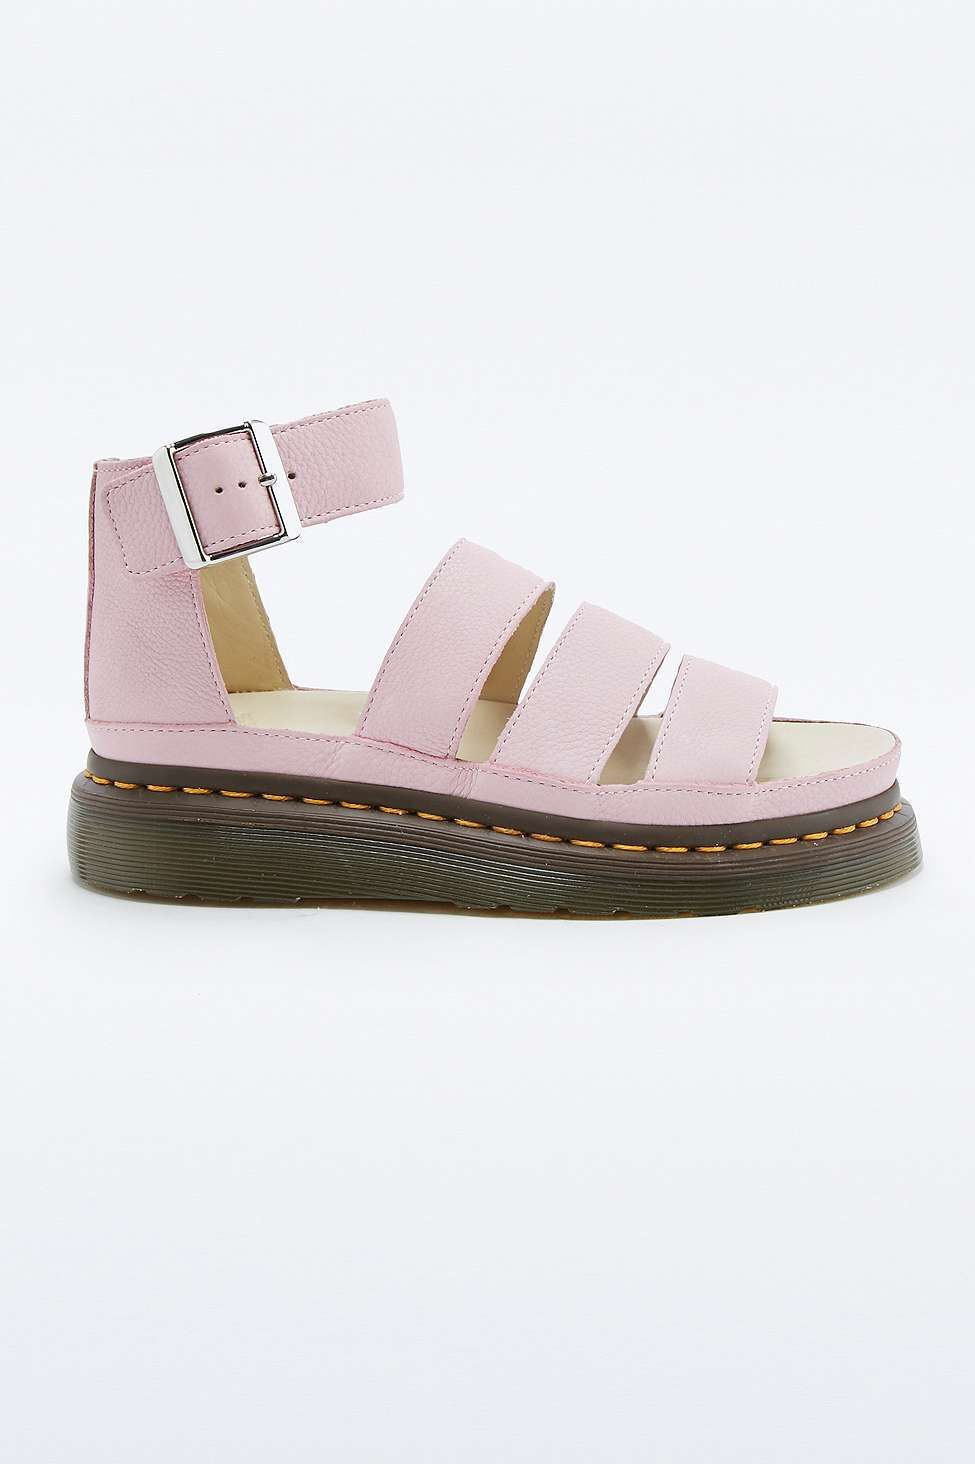 97cc5d025f4b Dr. Martens Clarissa Pink Strap Sandals